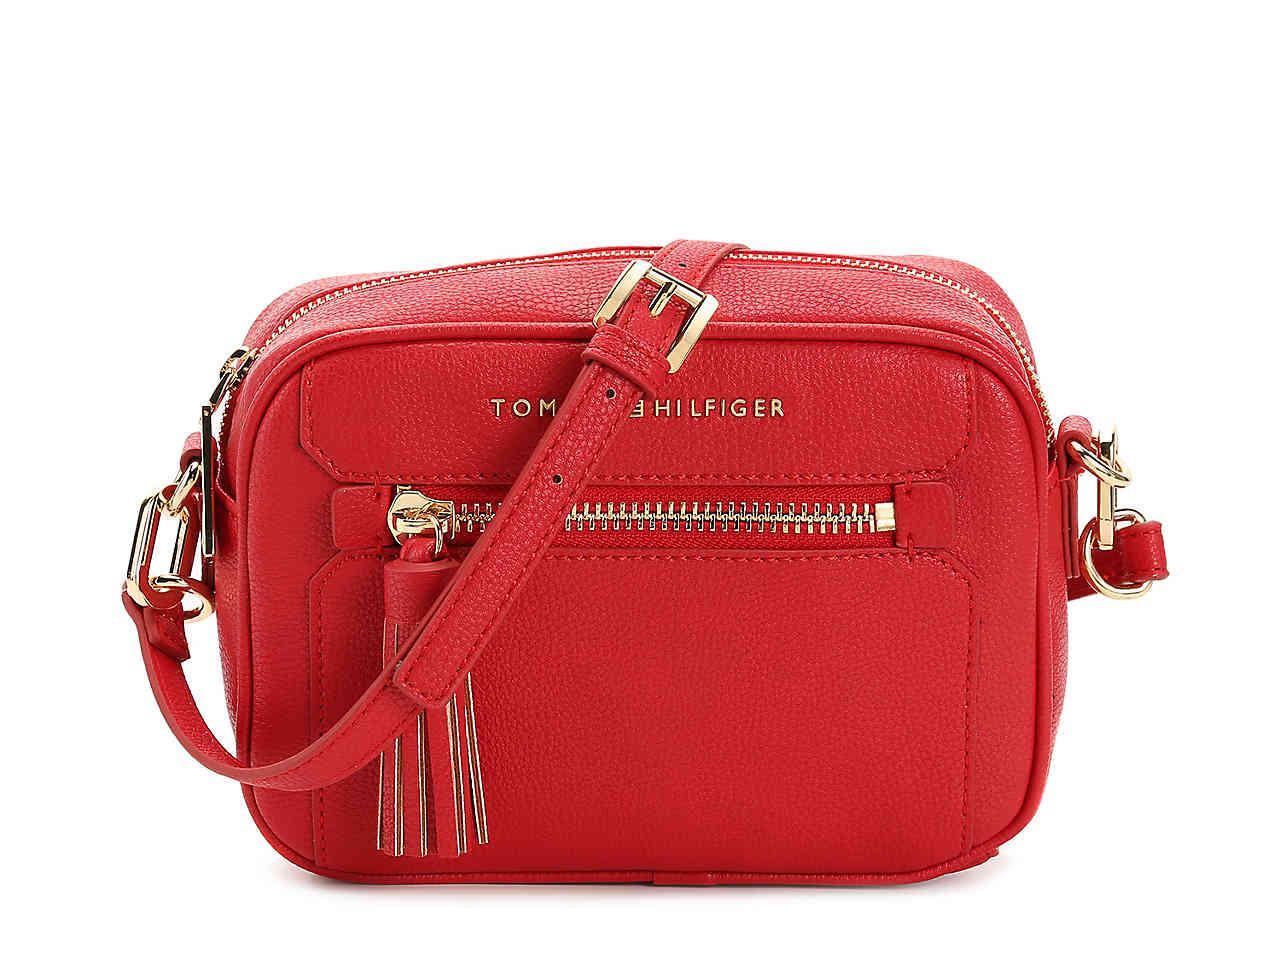 66235eeaea Lyst - Tommy Hilfiger Macon Crossbody Bag in Red